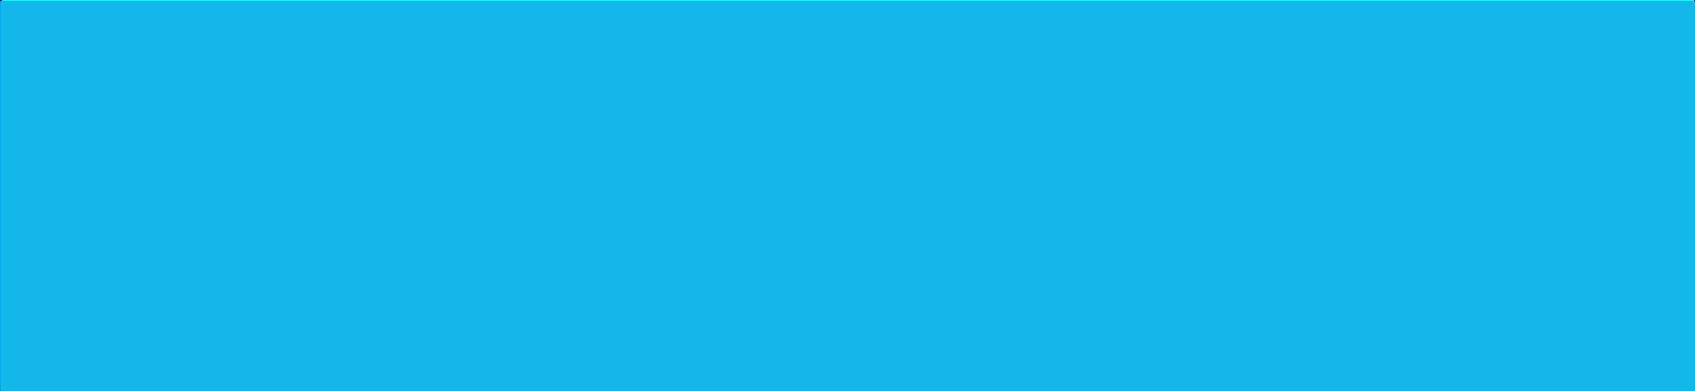 blue-banner.png